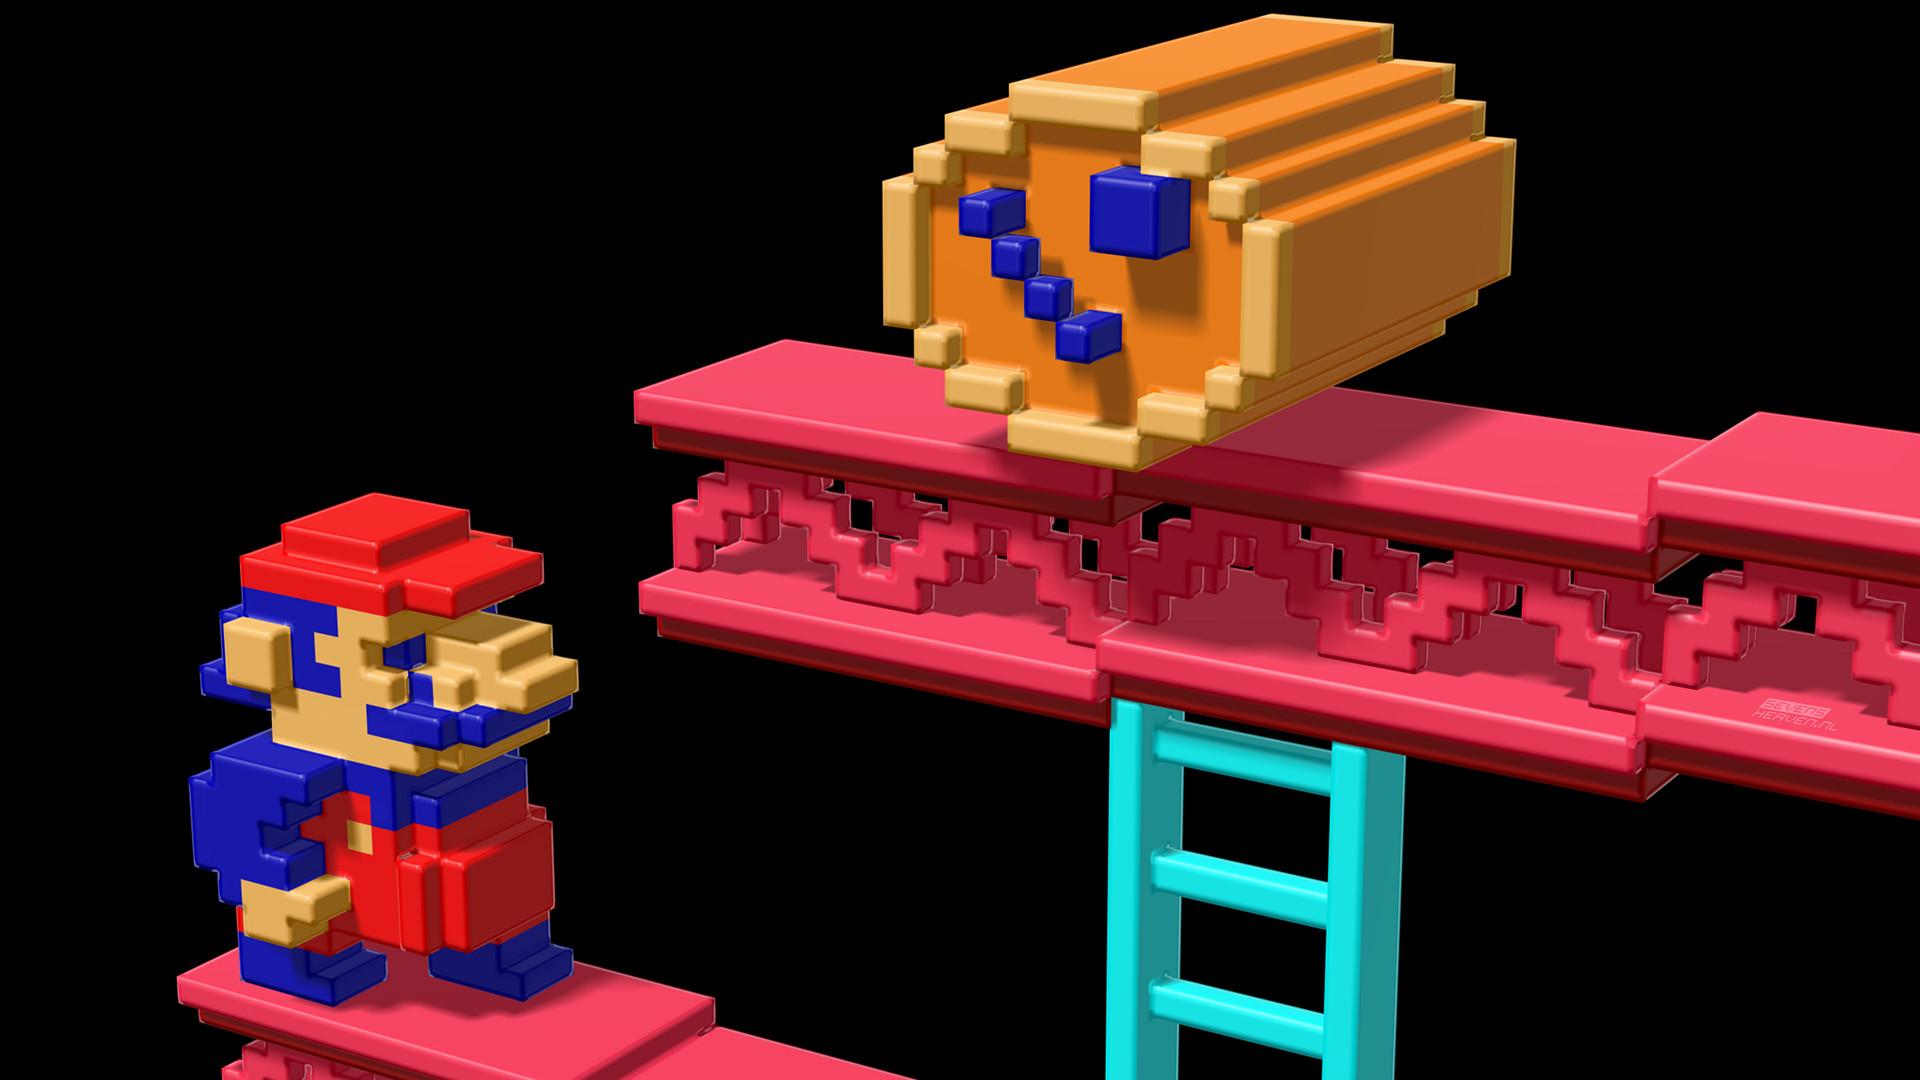 Wallpaper Roundup: Retro Video Games as Awesome Pixel Art